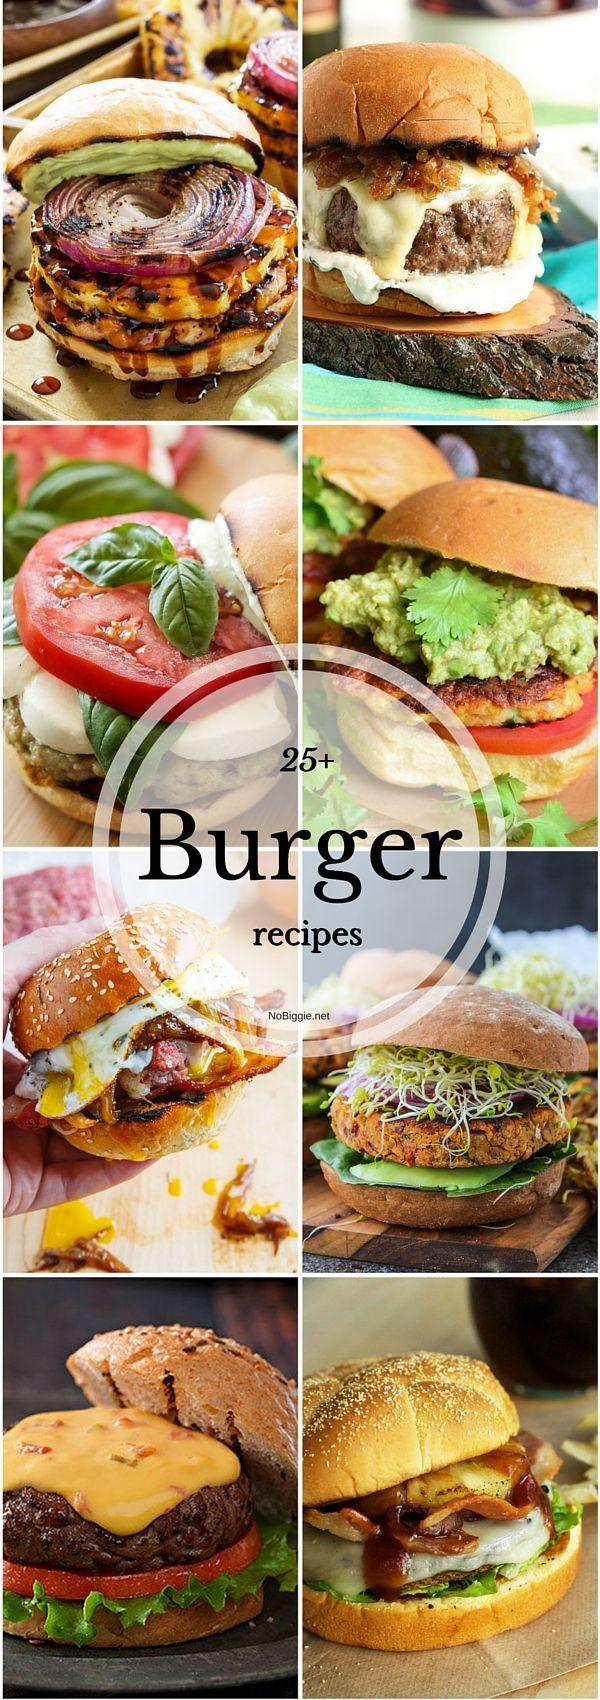 25+ Burger recipes | NoBiggie.net